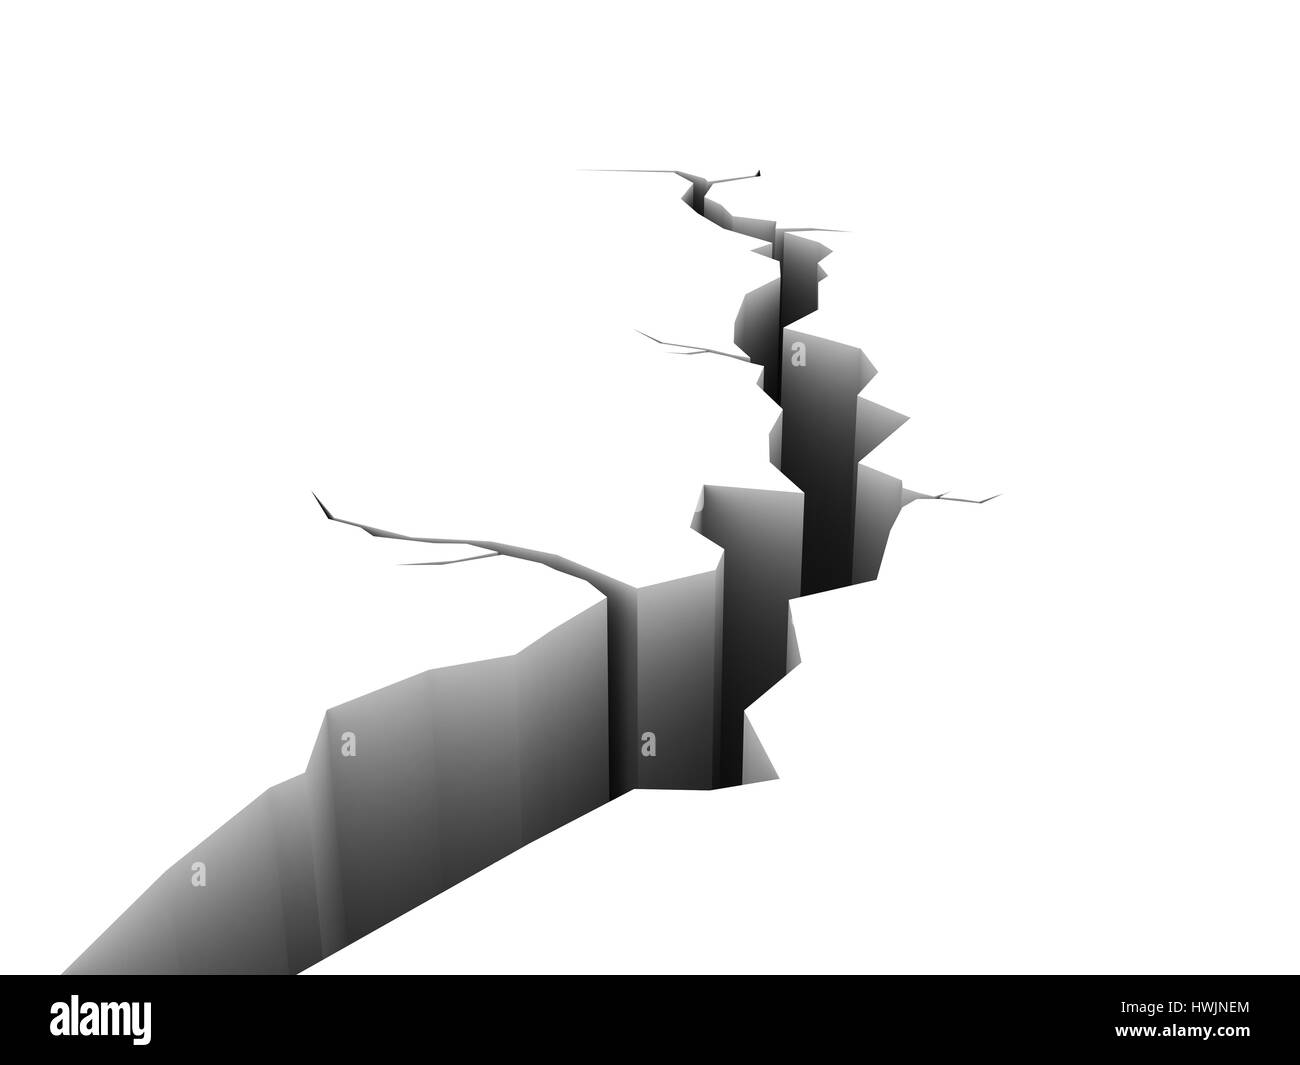 3d Illustration Of Crack Isolated Over White Background